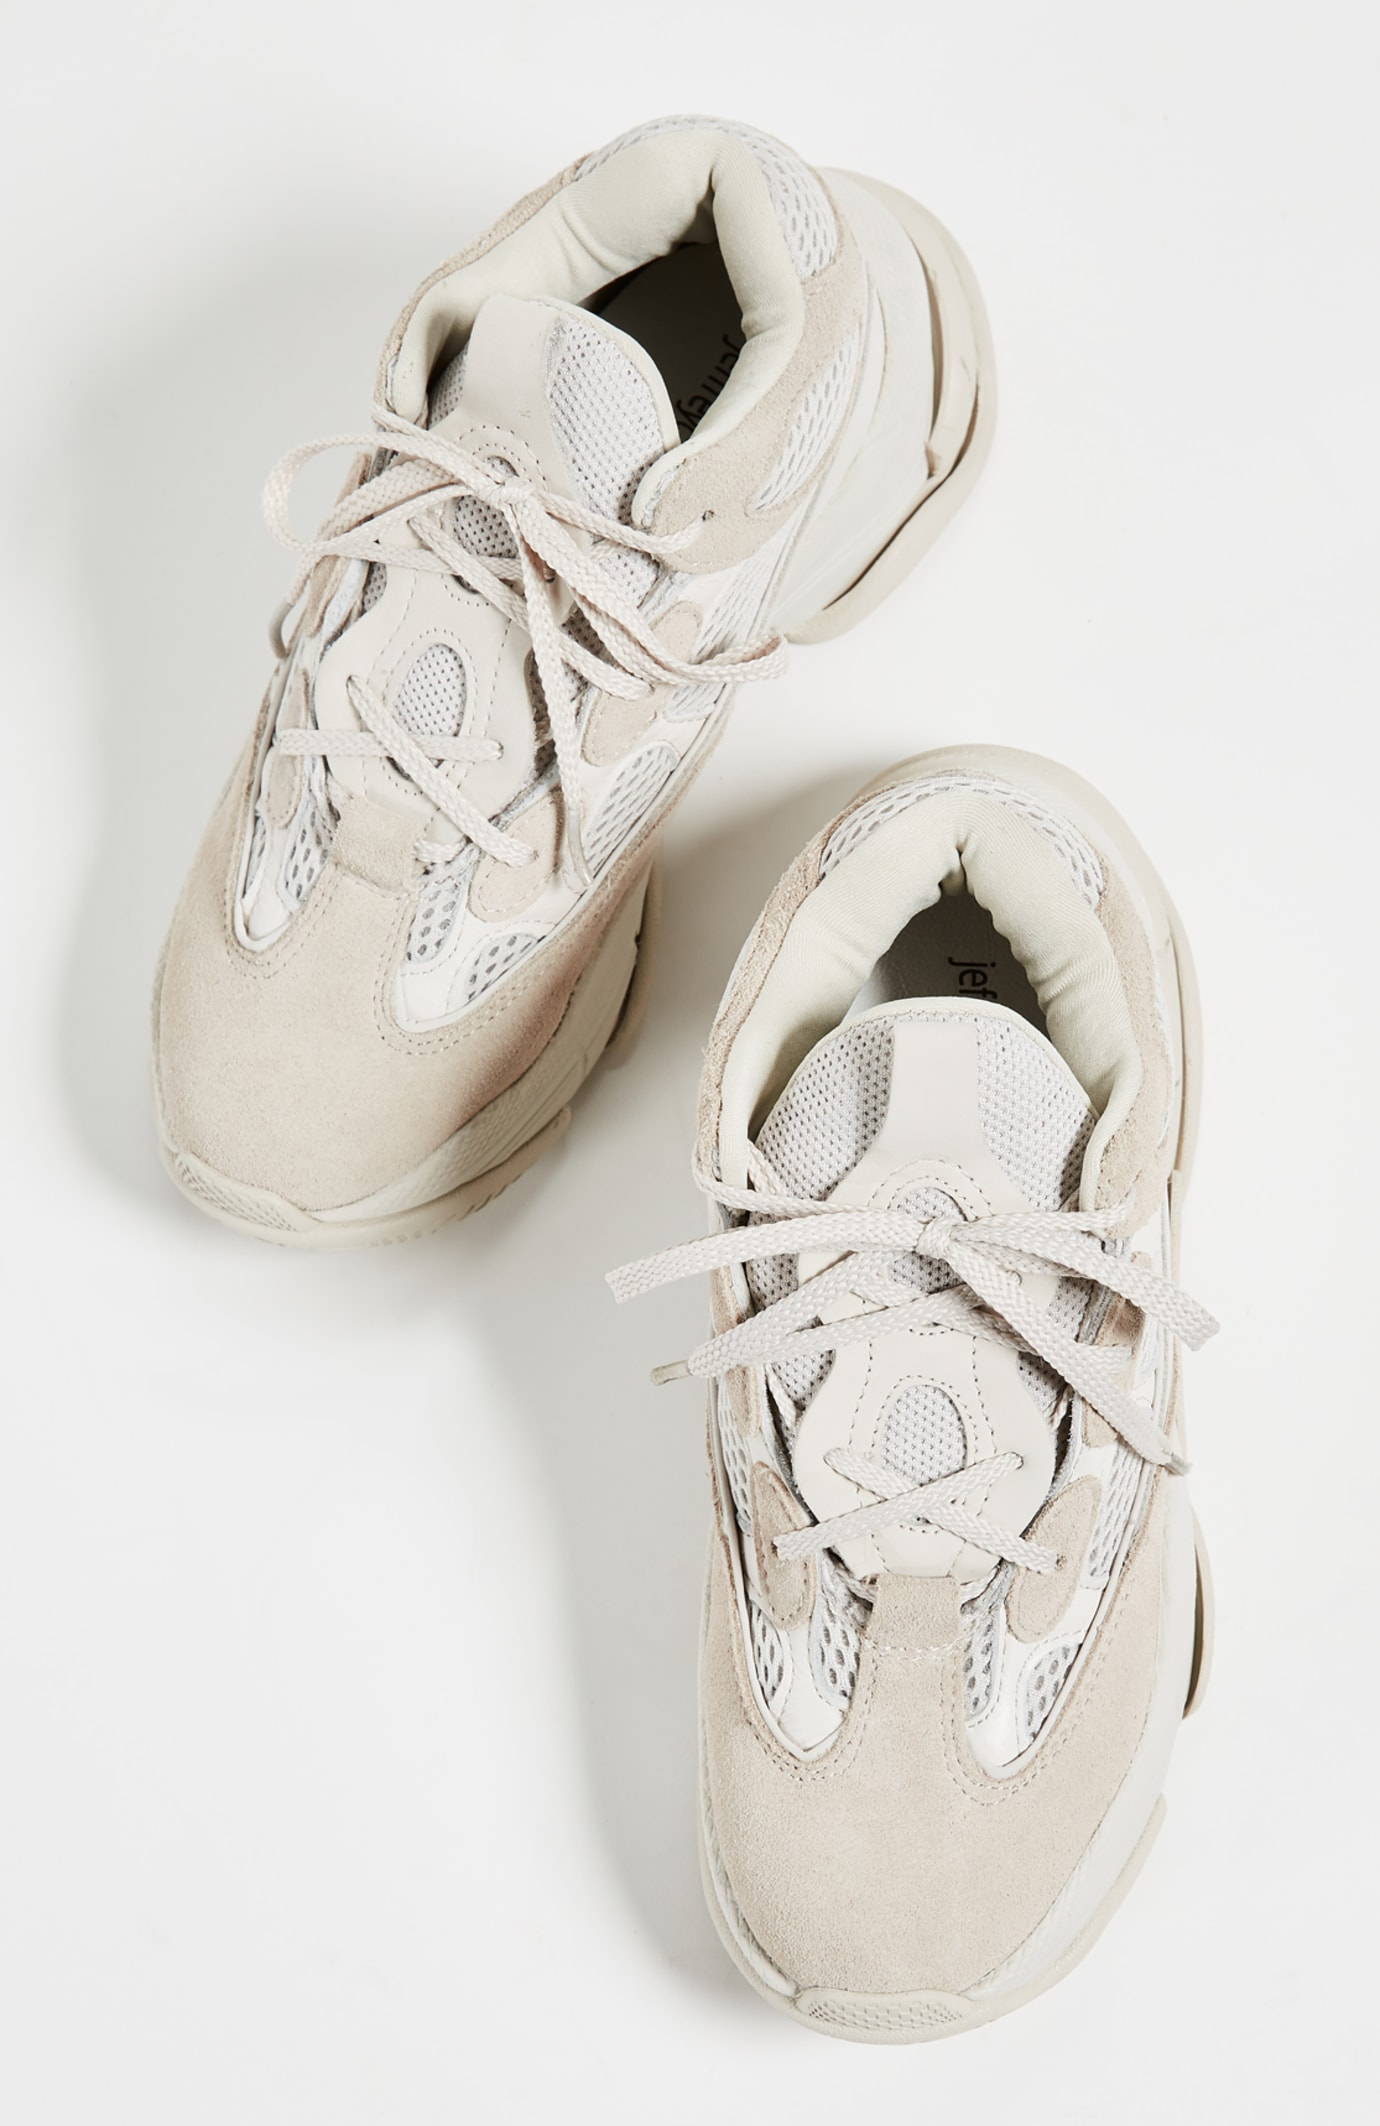 Jeffery Campbell Hotline Dad Sneakers (Top)